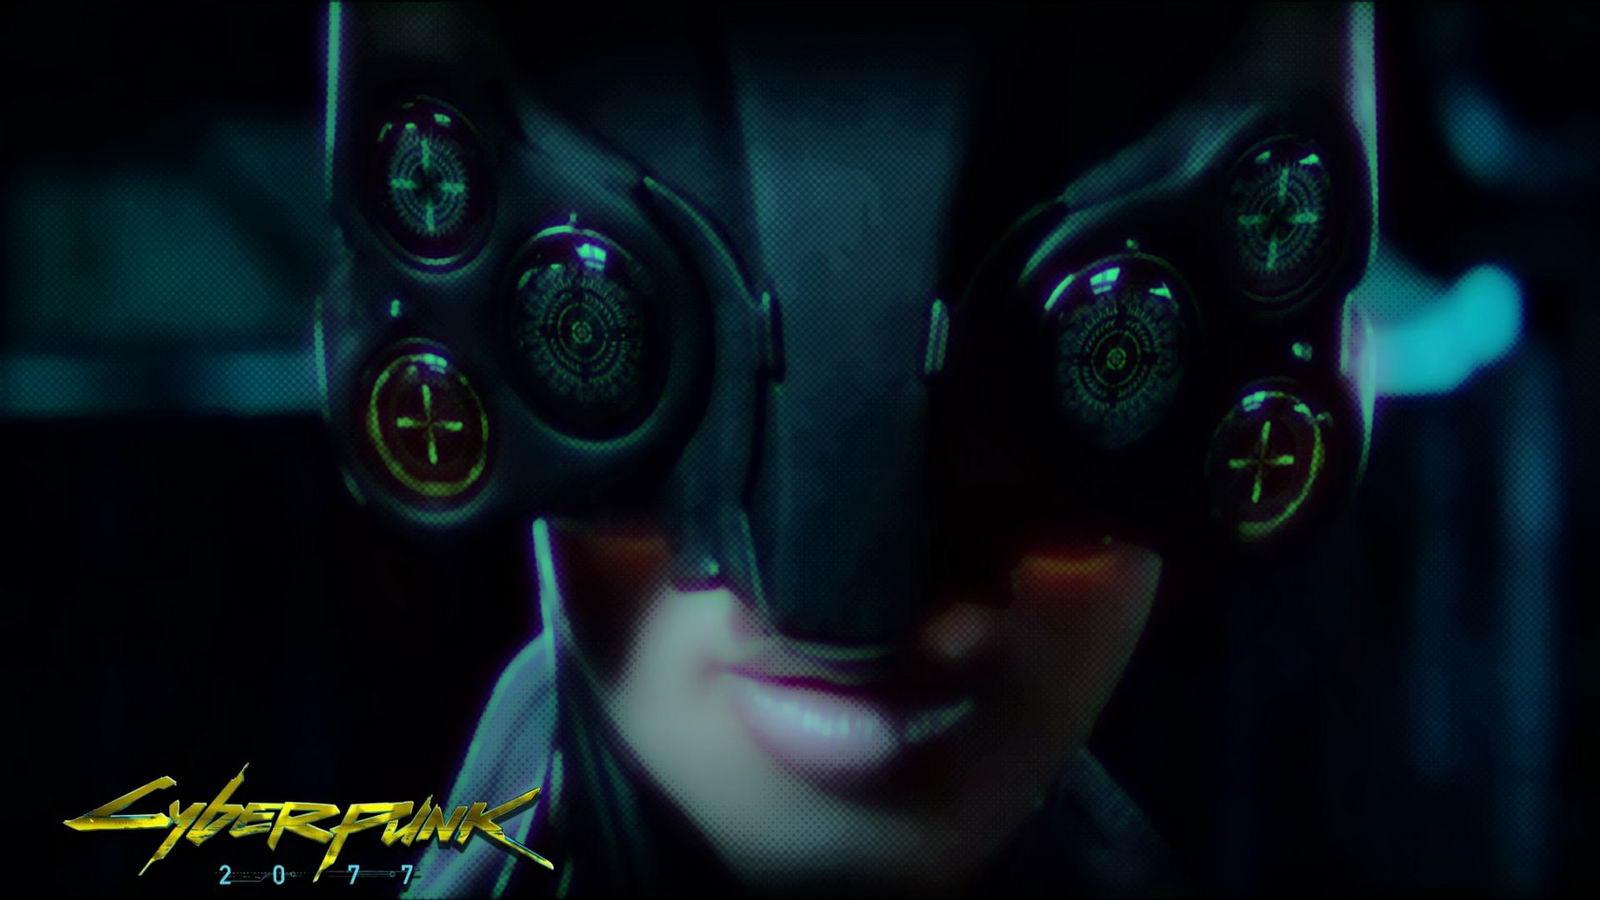 Арт Cyberpunk 2077